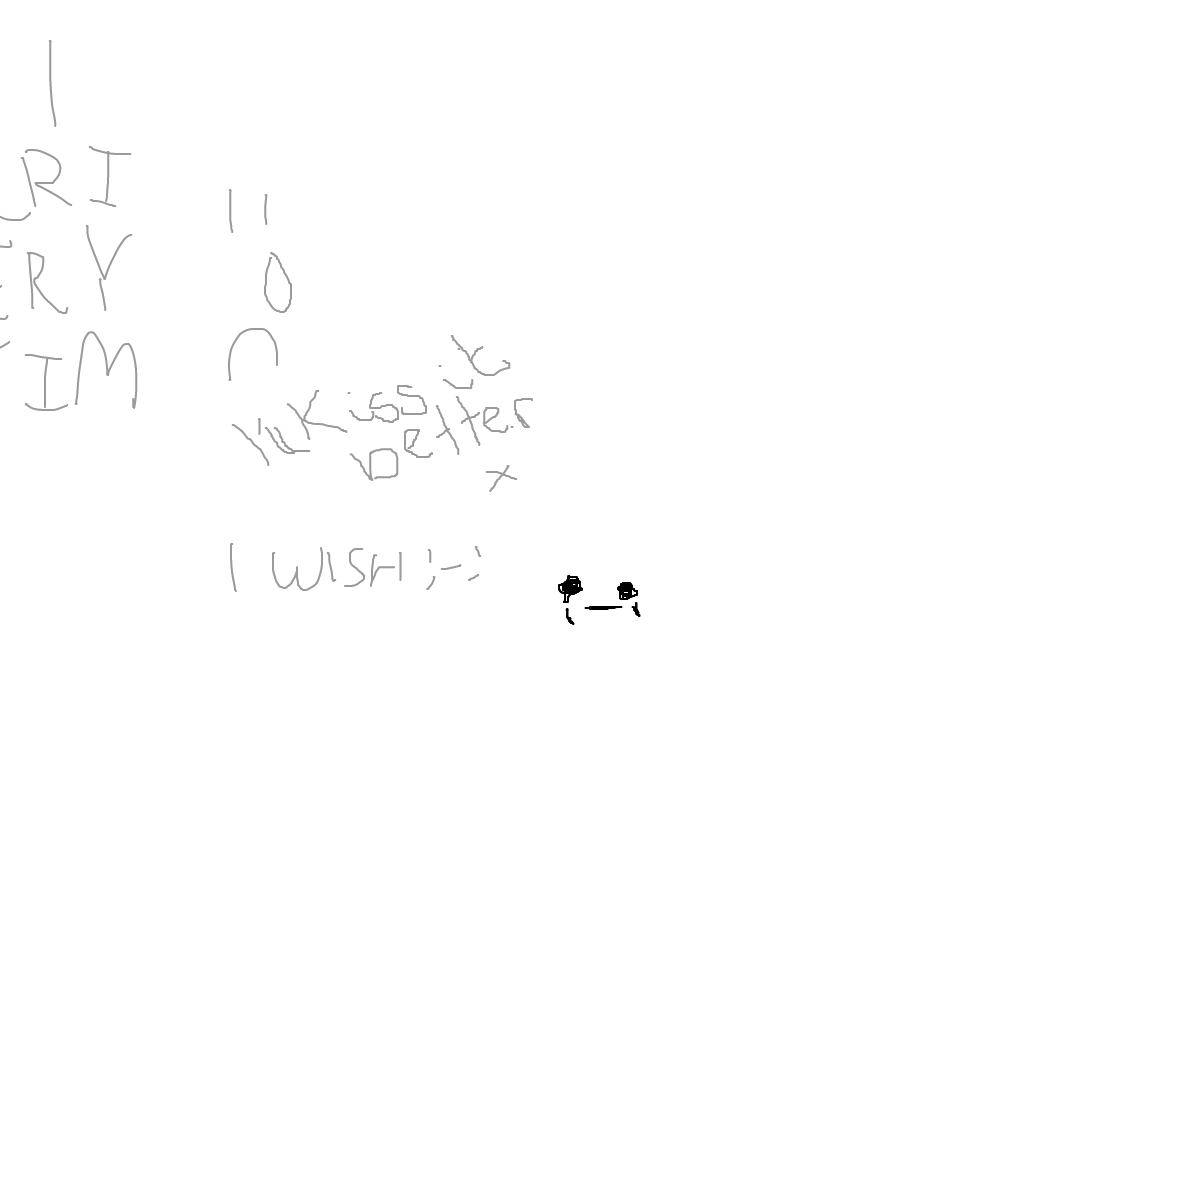 BAAAM drawing#280 lat:51.4956932067871100lng: -2.5085923671722410